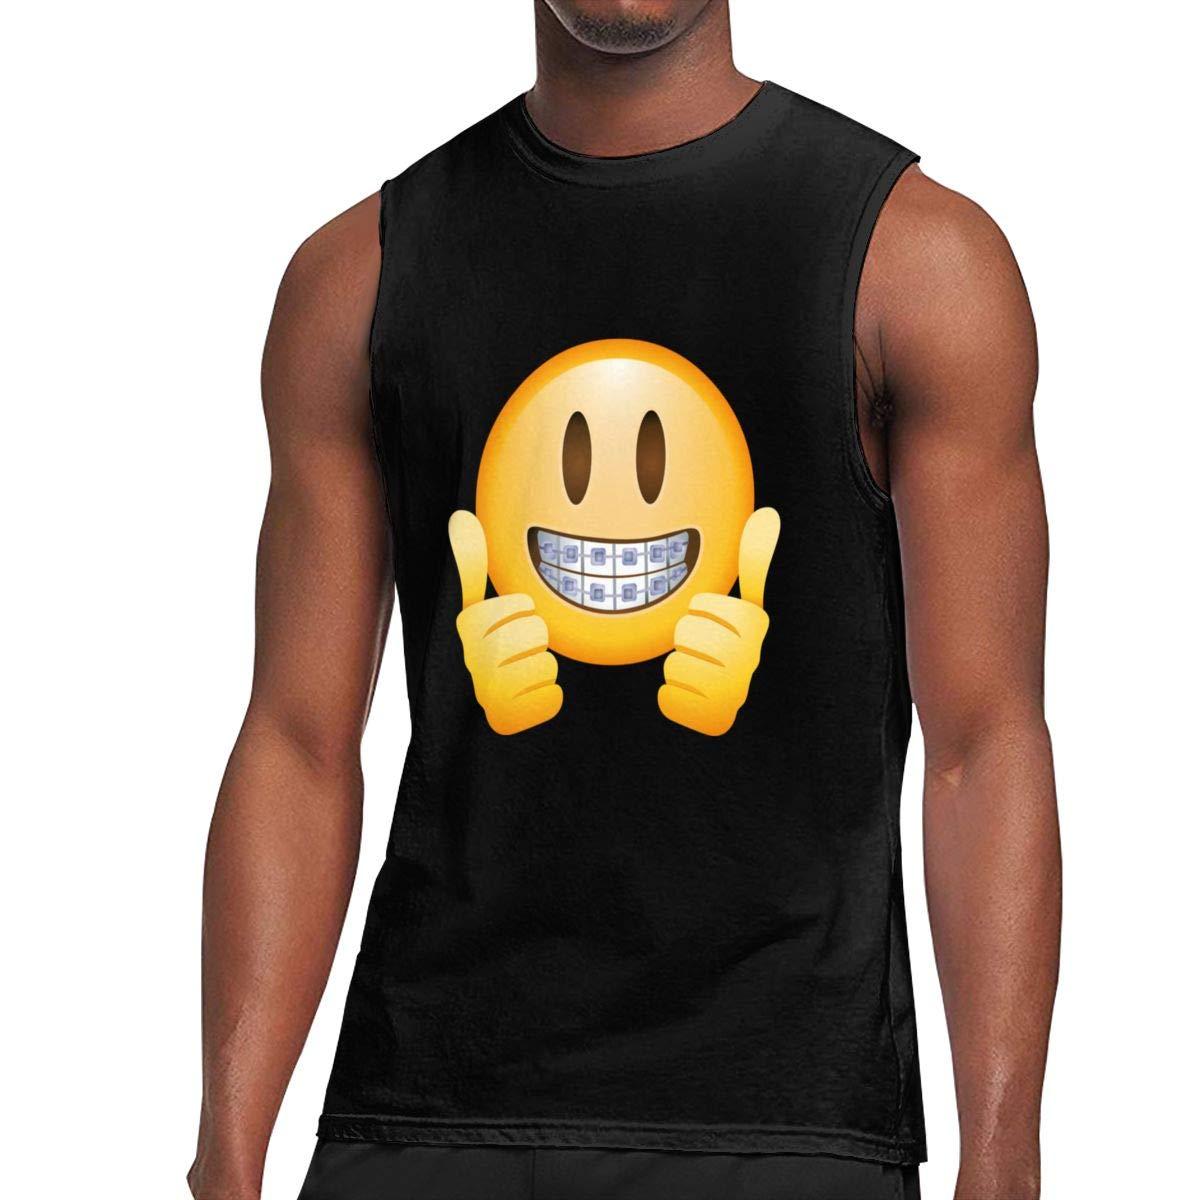 Seuriamin Thumbs Up Emoji S Fashion Travel Sleeveless Muscle Short Sleeve Ts Shirts